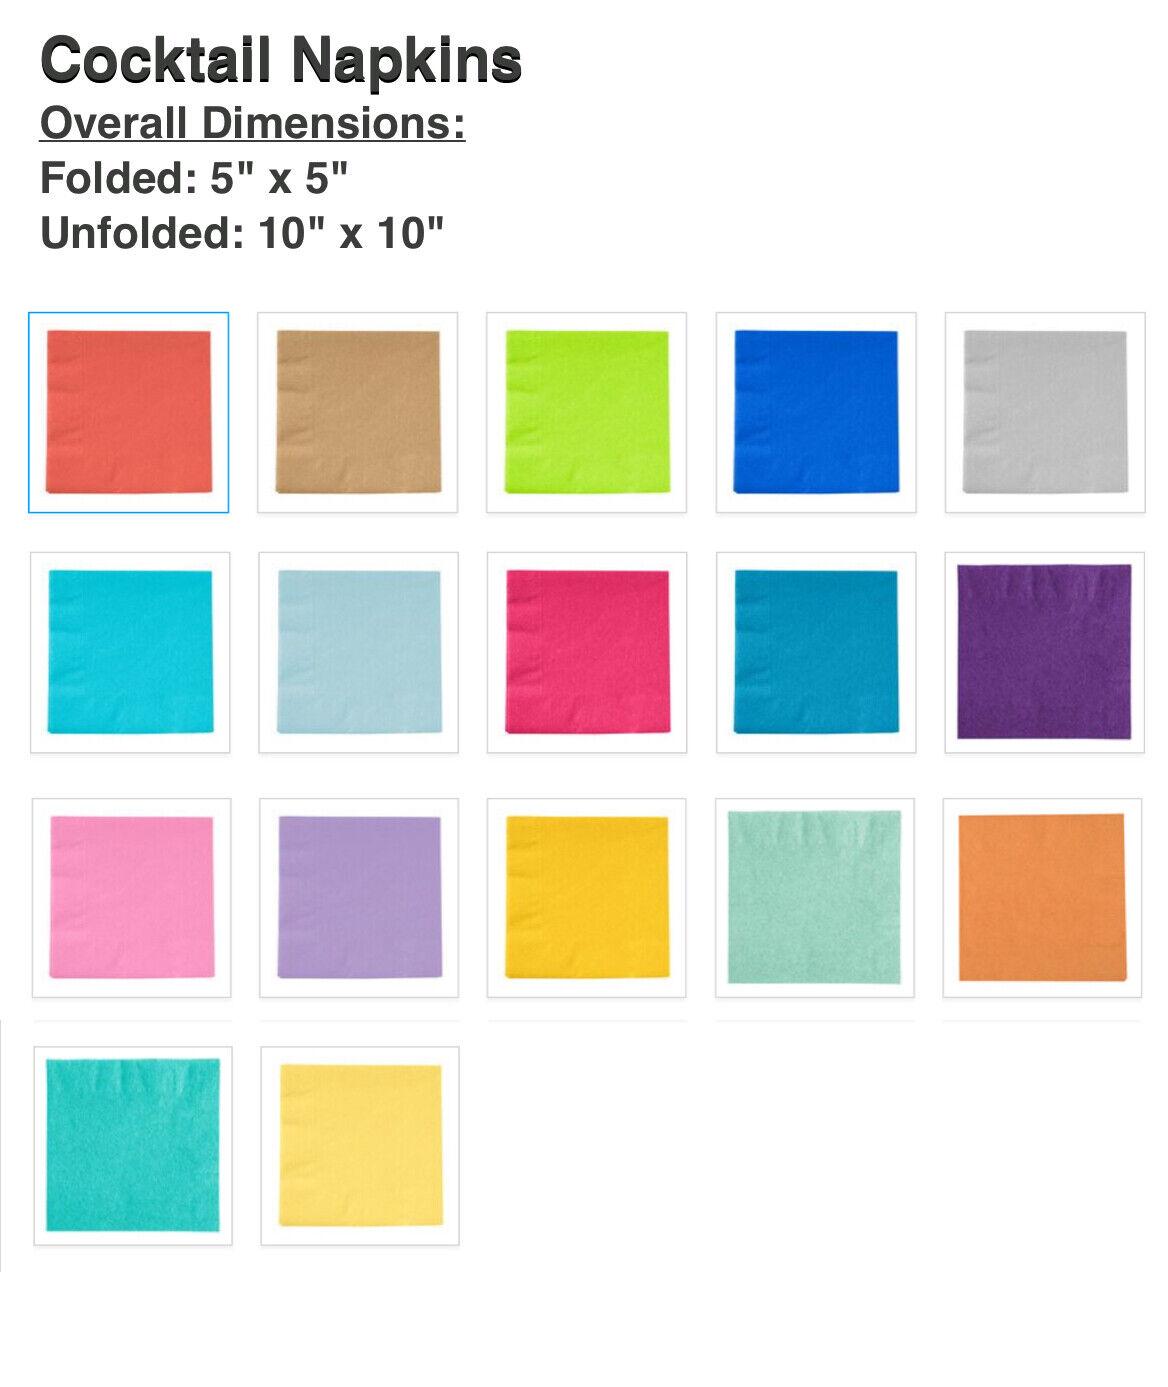 "medium green 15 ¾x15 ¾ /"" NEW FANTASTISK Paper napkin 50 Pack"